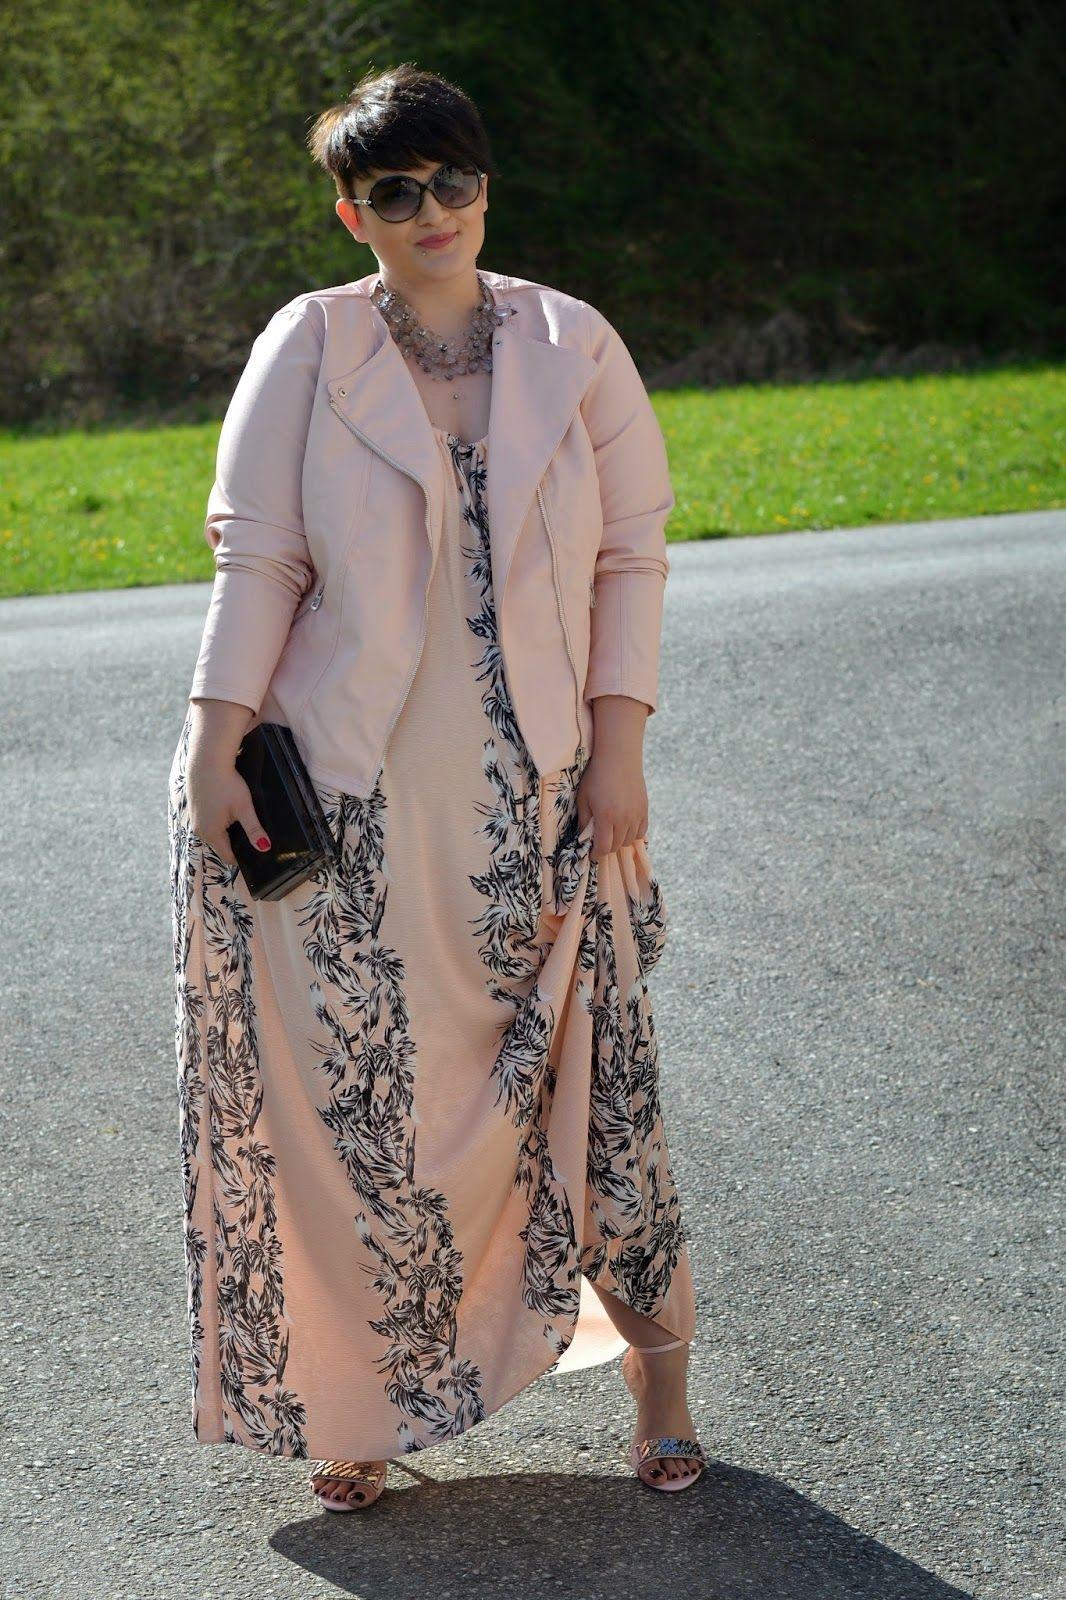 Plus Size Fashion - Curvy Claudia: Blush   Church outfits ...